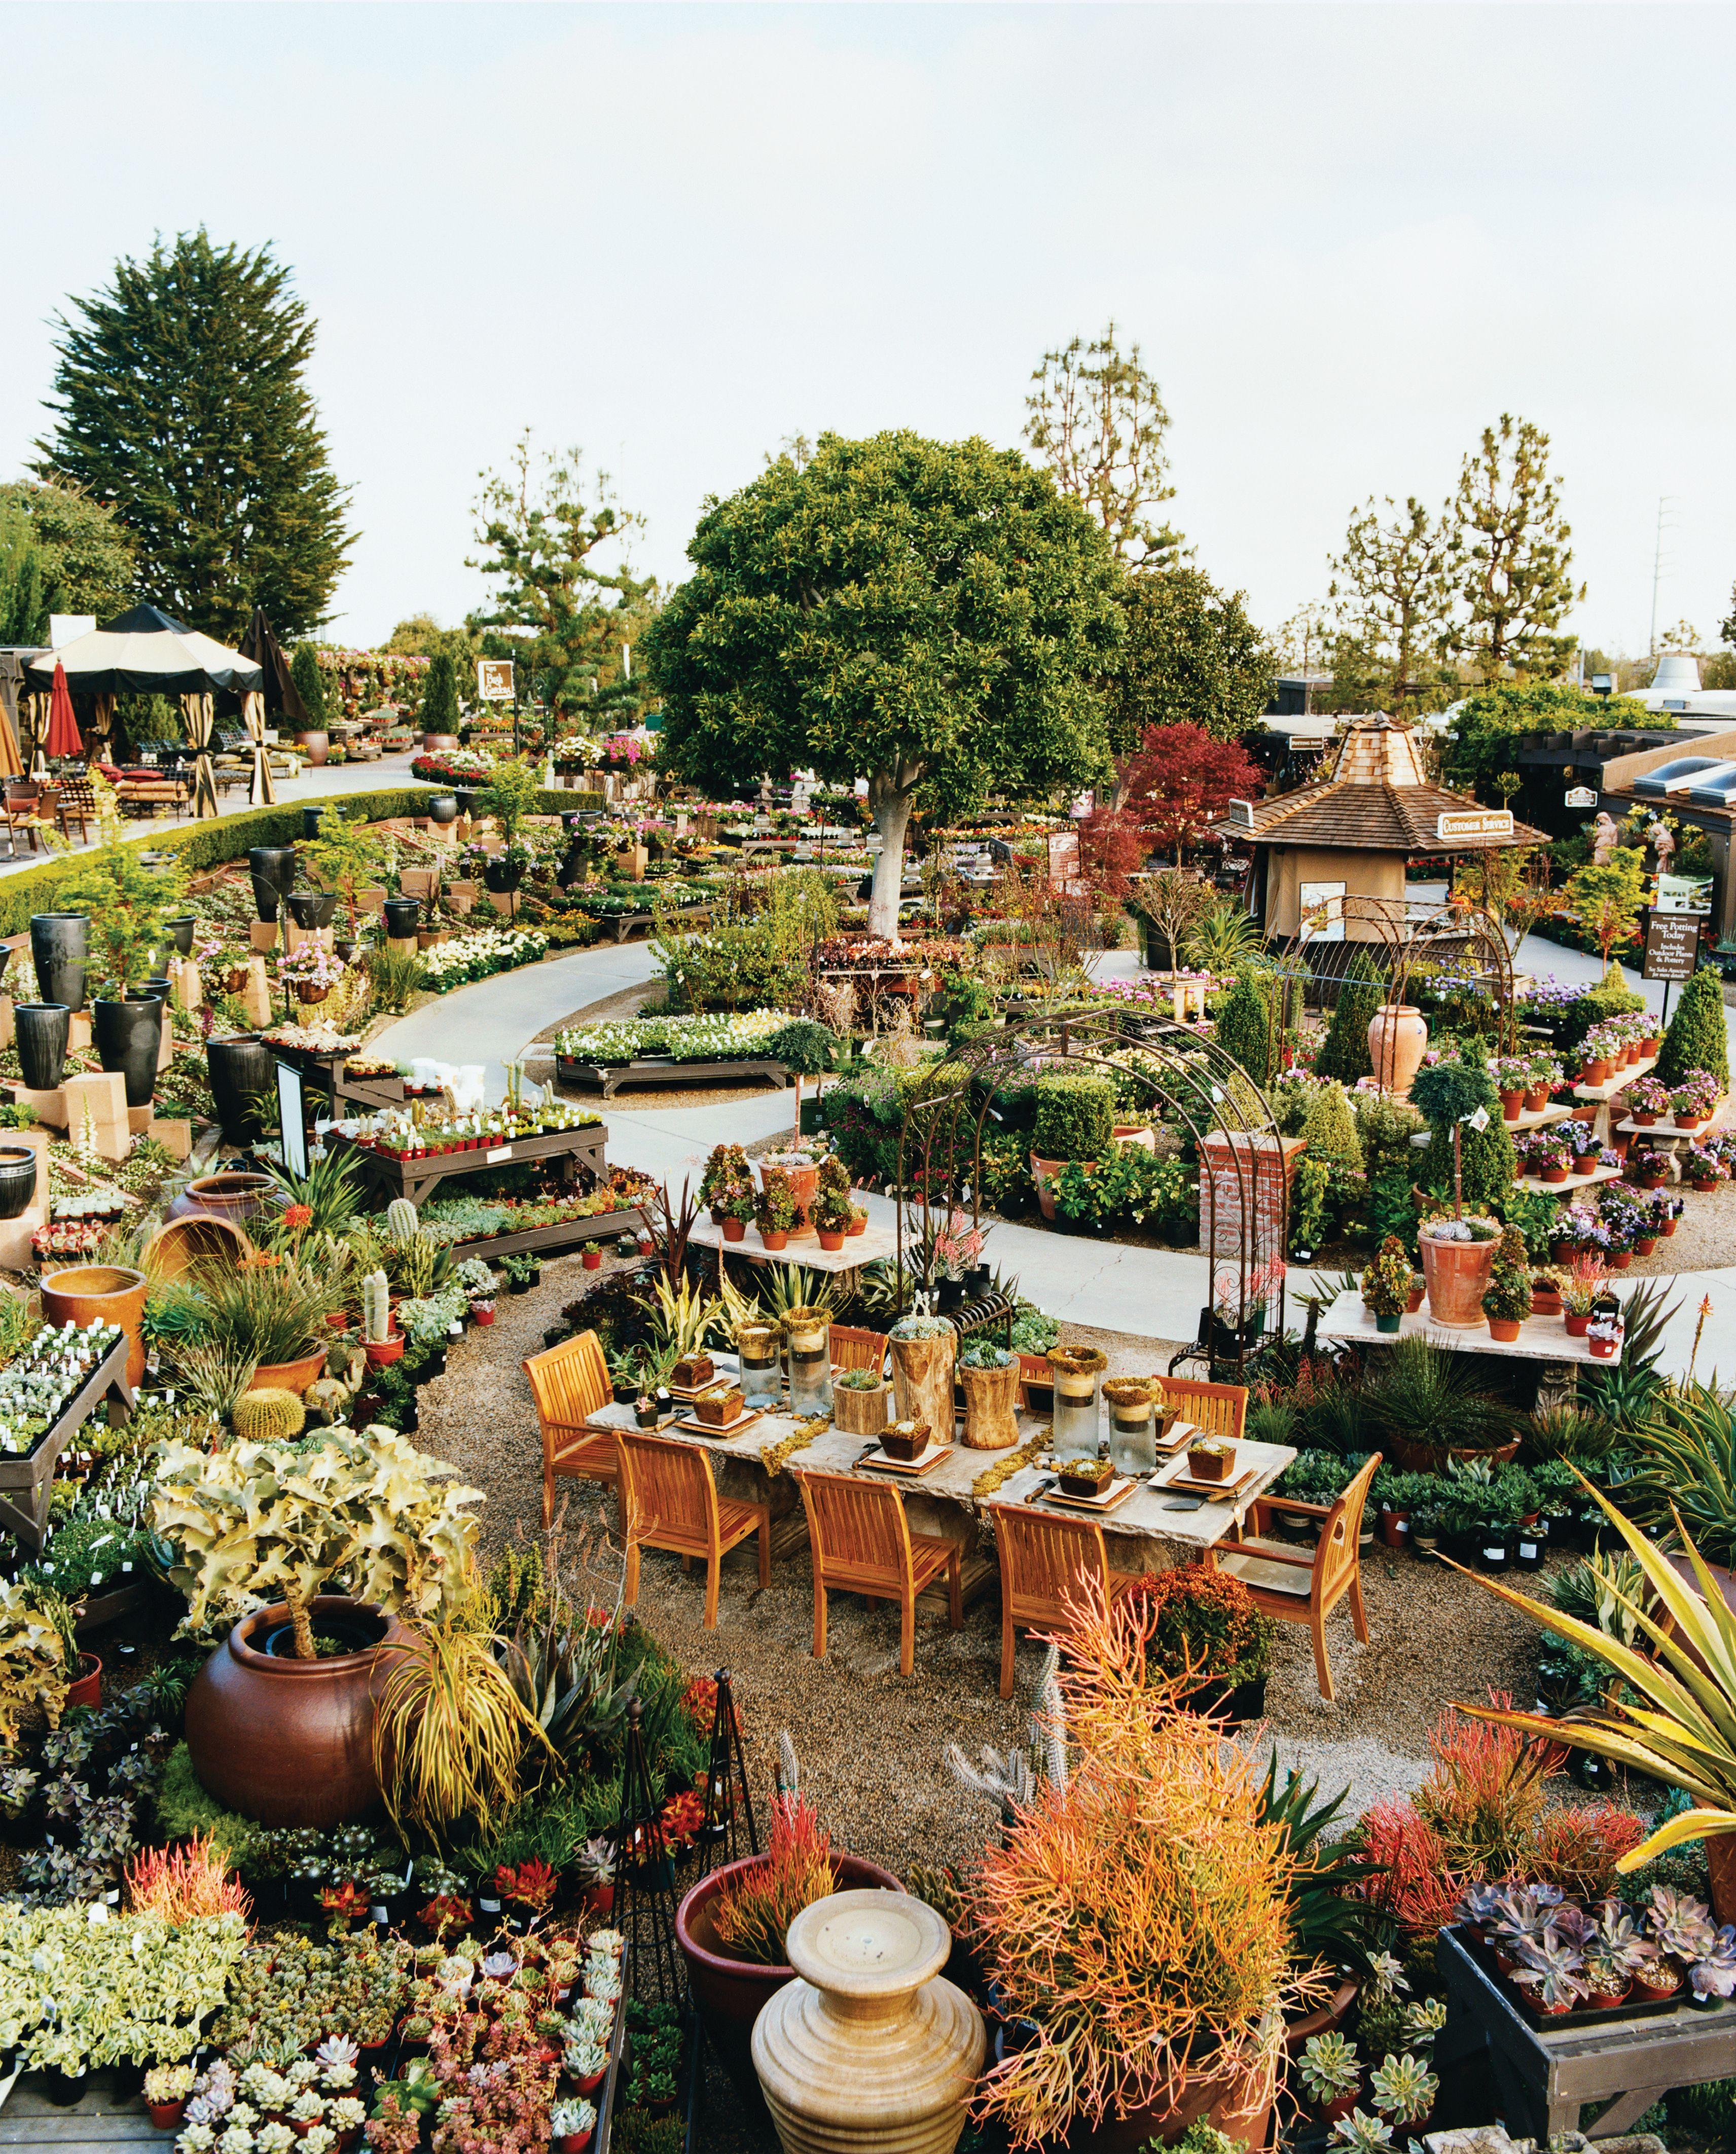 Great Spring Vacation Ideas Rogers gardens, Corona del